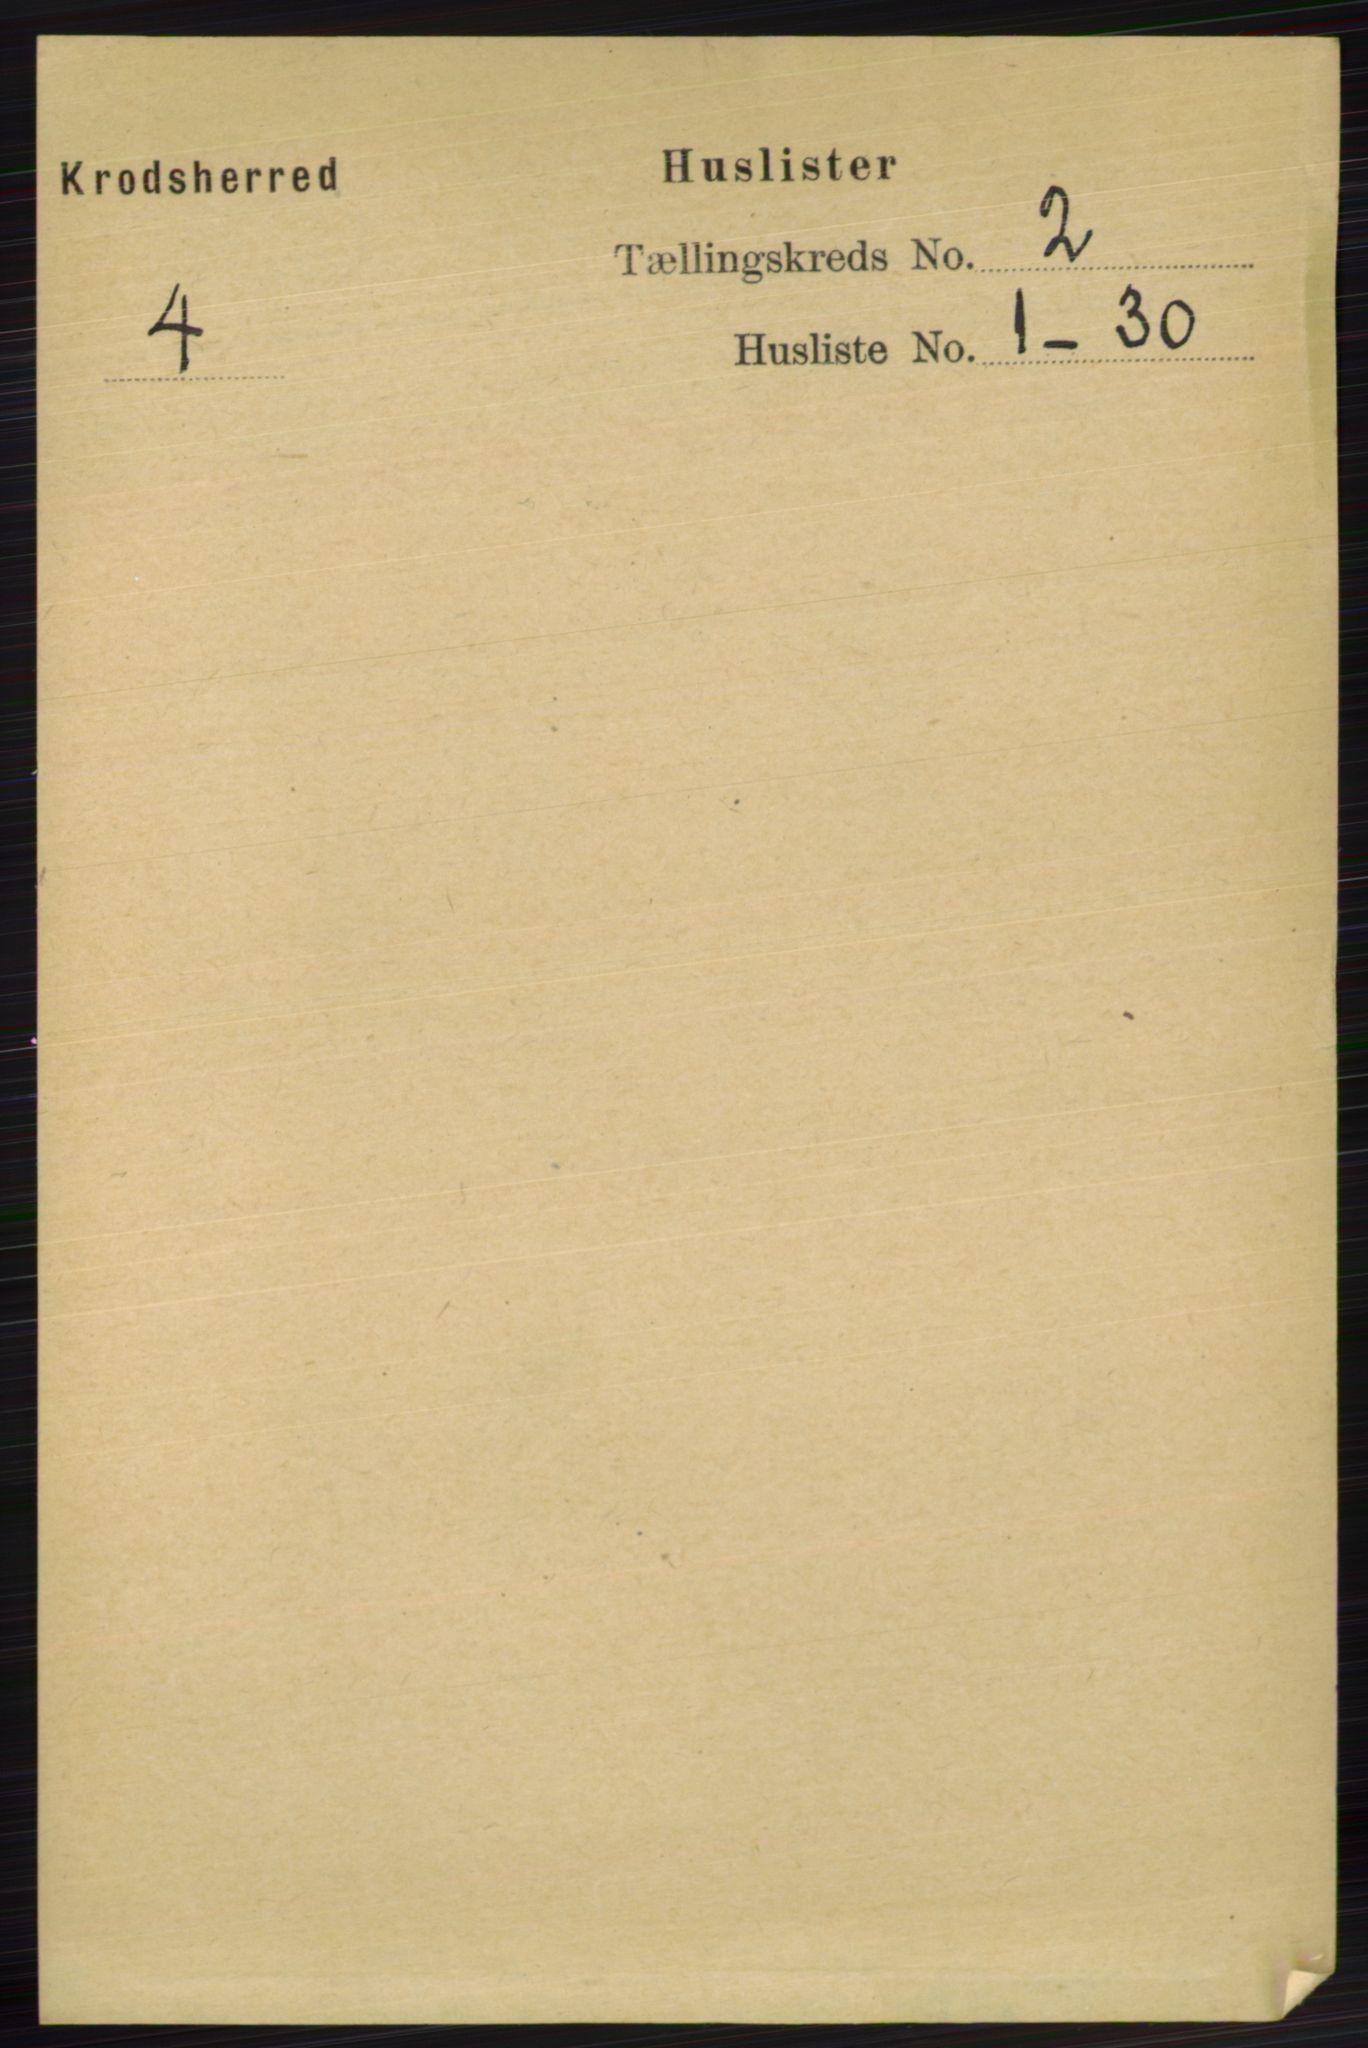 RA, Folketelling 1891 for 0621 Sigdal herred, 1891, s. 5283